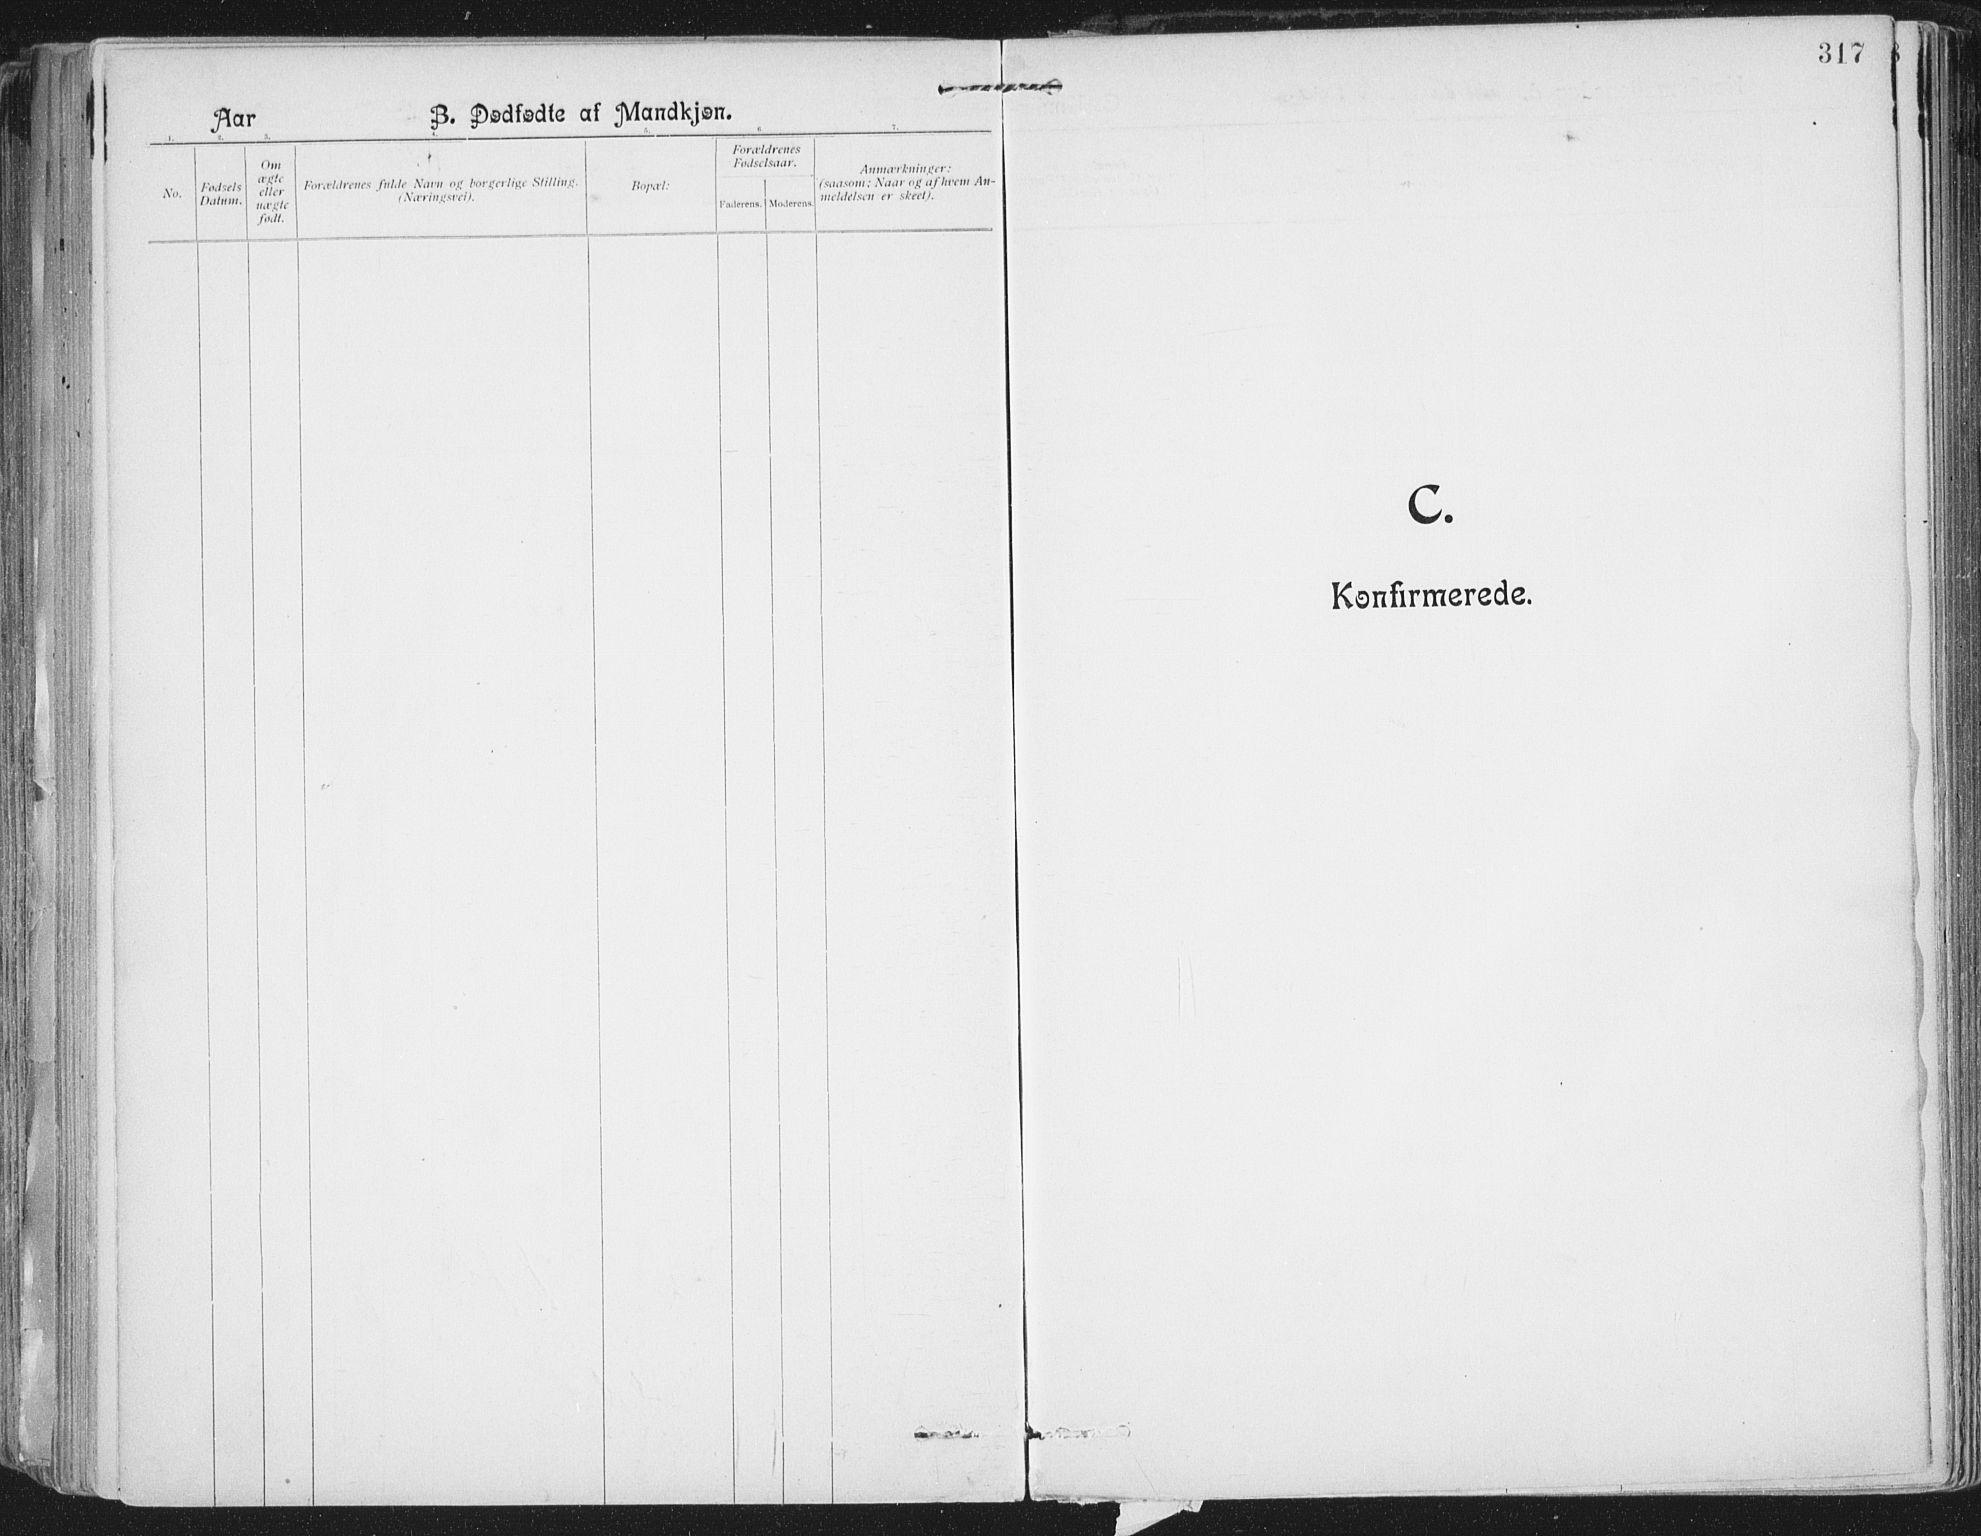 SAT, Ministerialprotokoller, klokkerbøker og fødselsregistre - Nordland, 801/L0011: Ministerialbok nr. 801A11, 1900-1916, s. 317